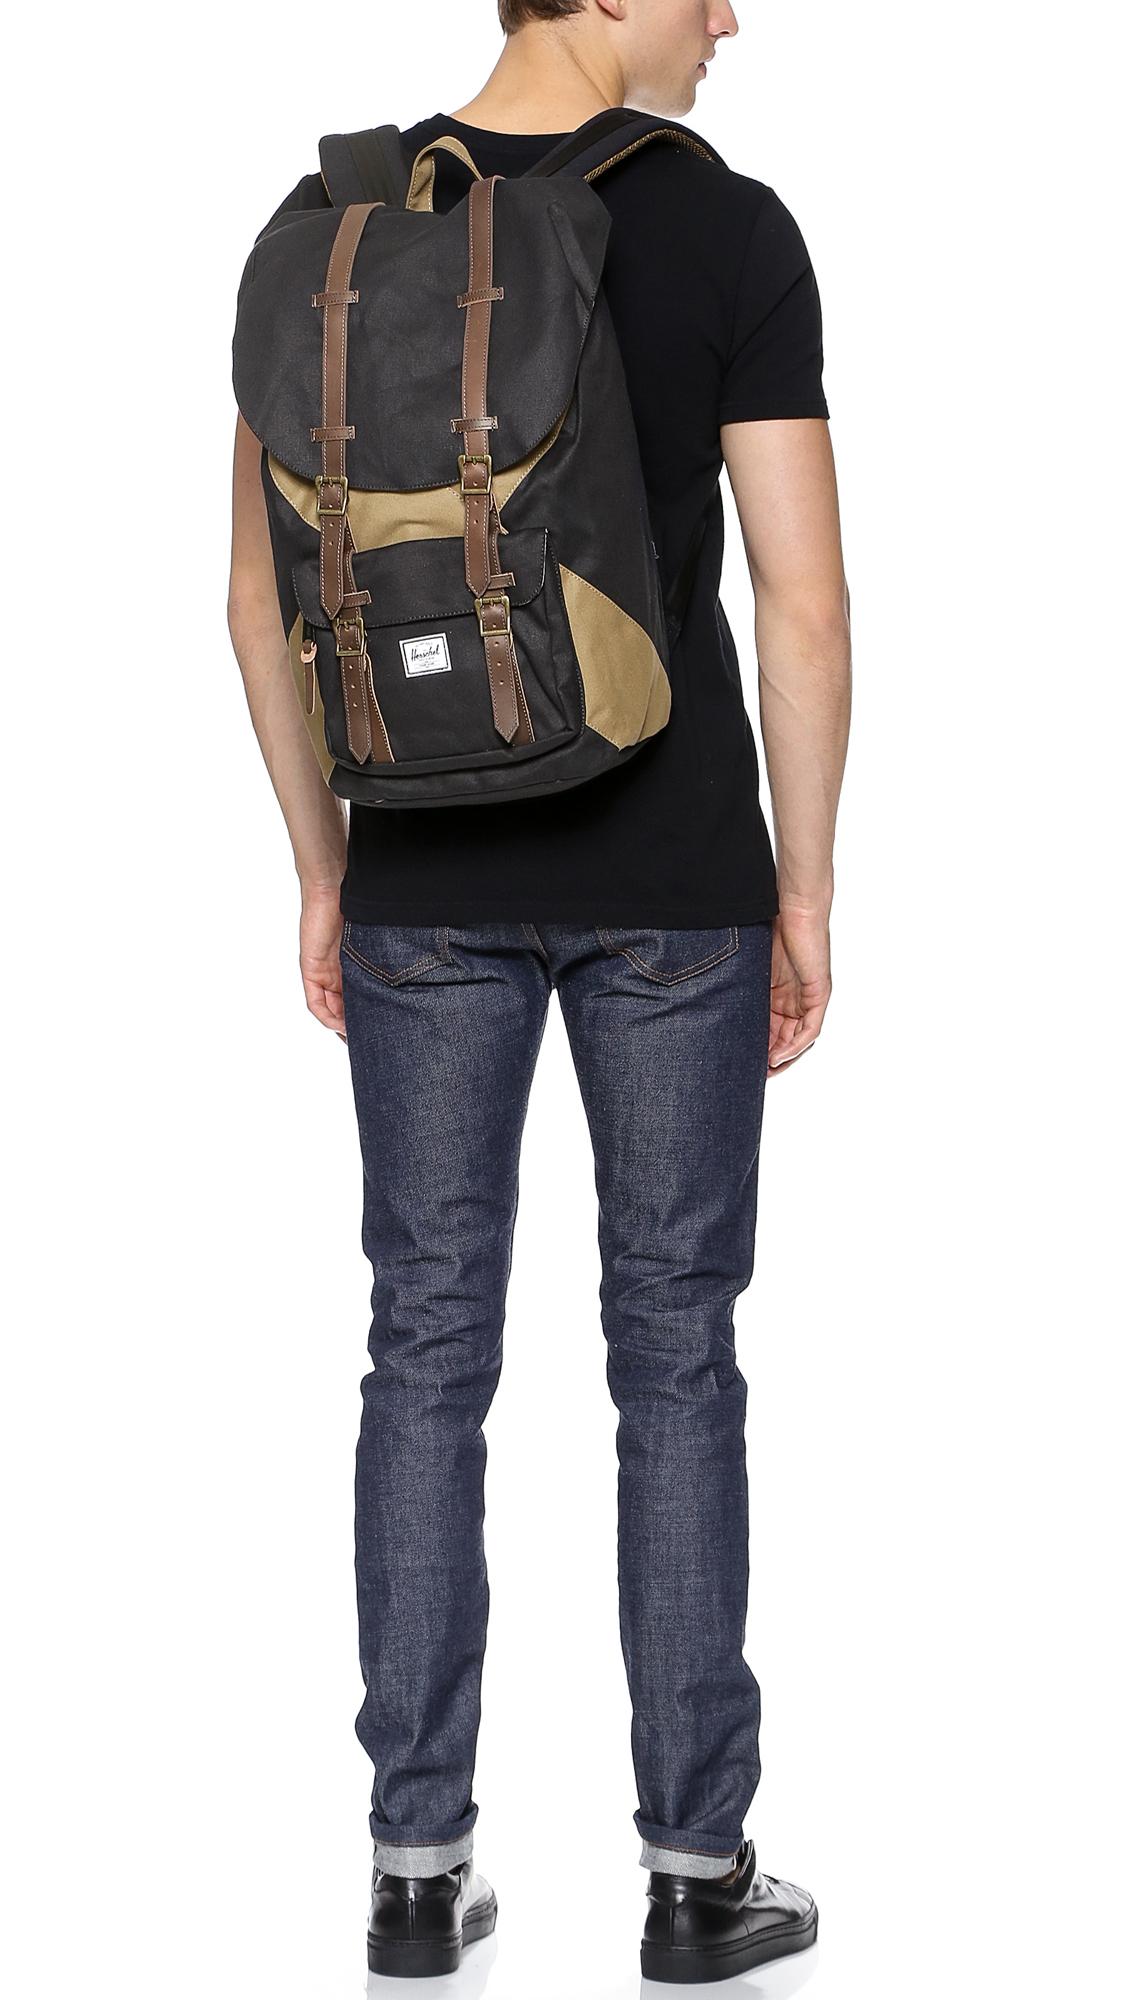 444c069889 Lyst - Herschel Supply Co. Little America Studio Backpack in Black for Men